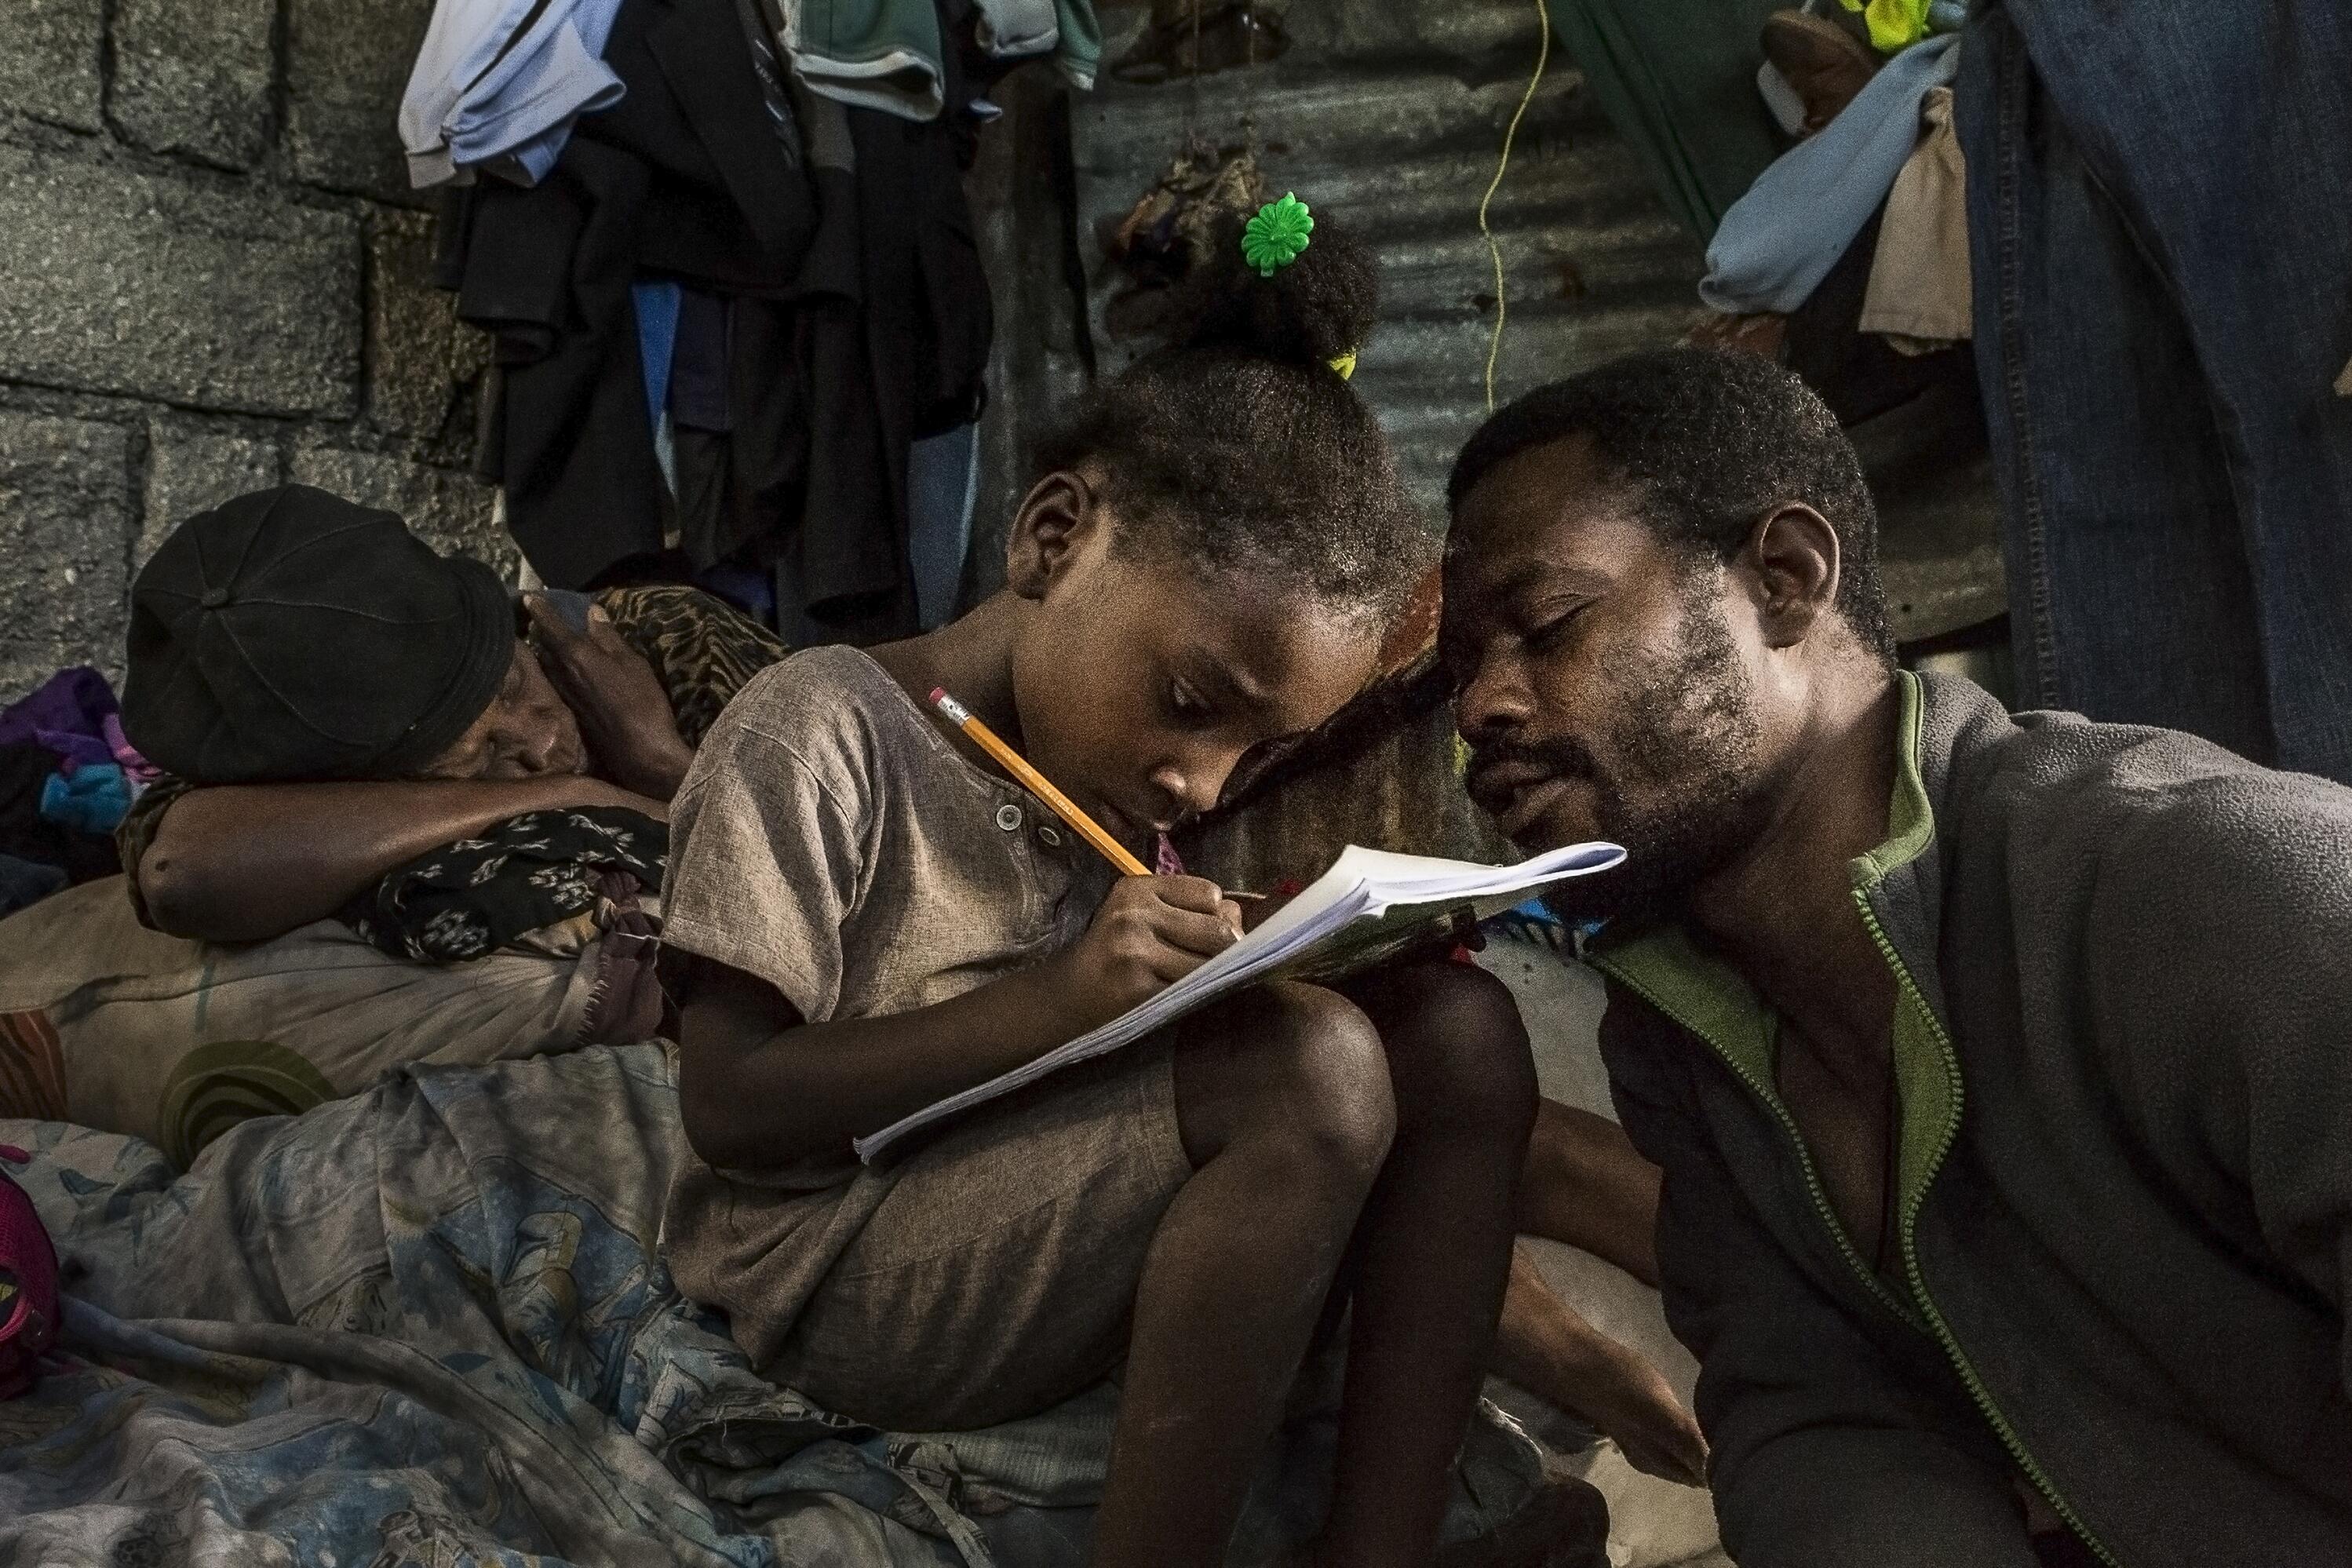 Bild zu Haiti, Slum, Mut, Armut